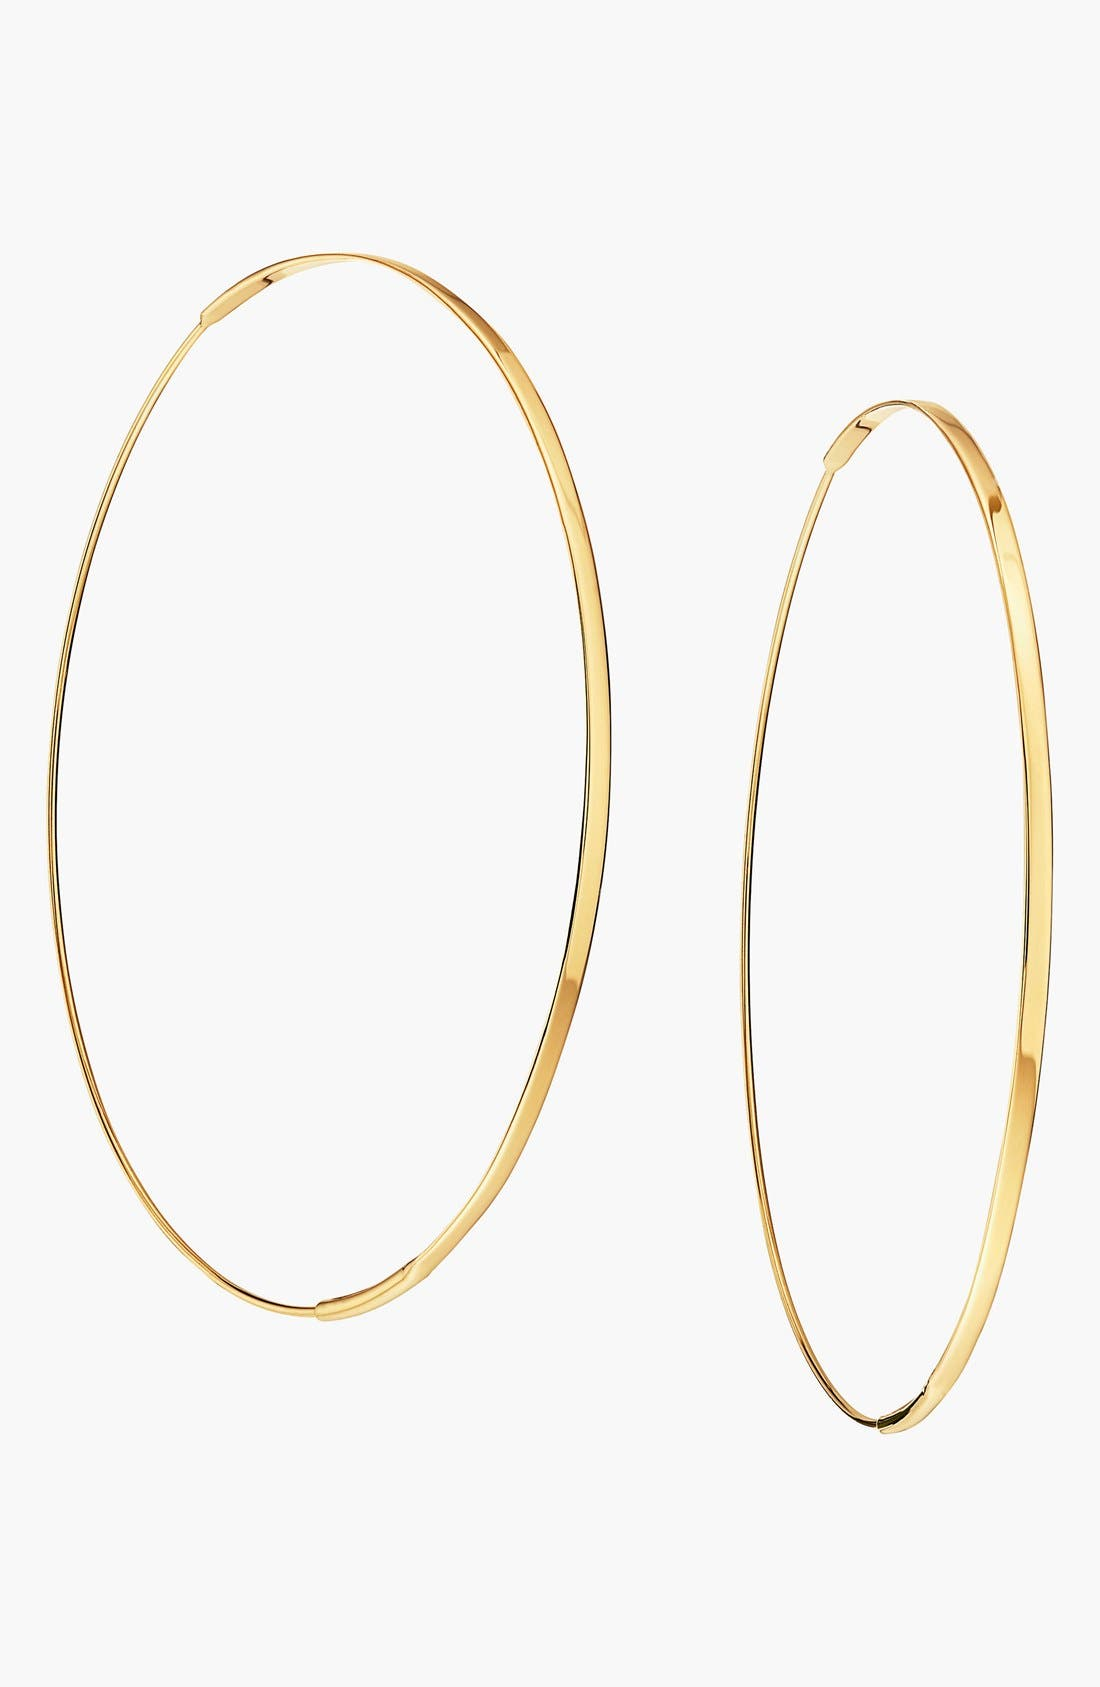 'Large Flat Magic' Hoop Earrings,                         Main,                         color, YELLOW GOLD